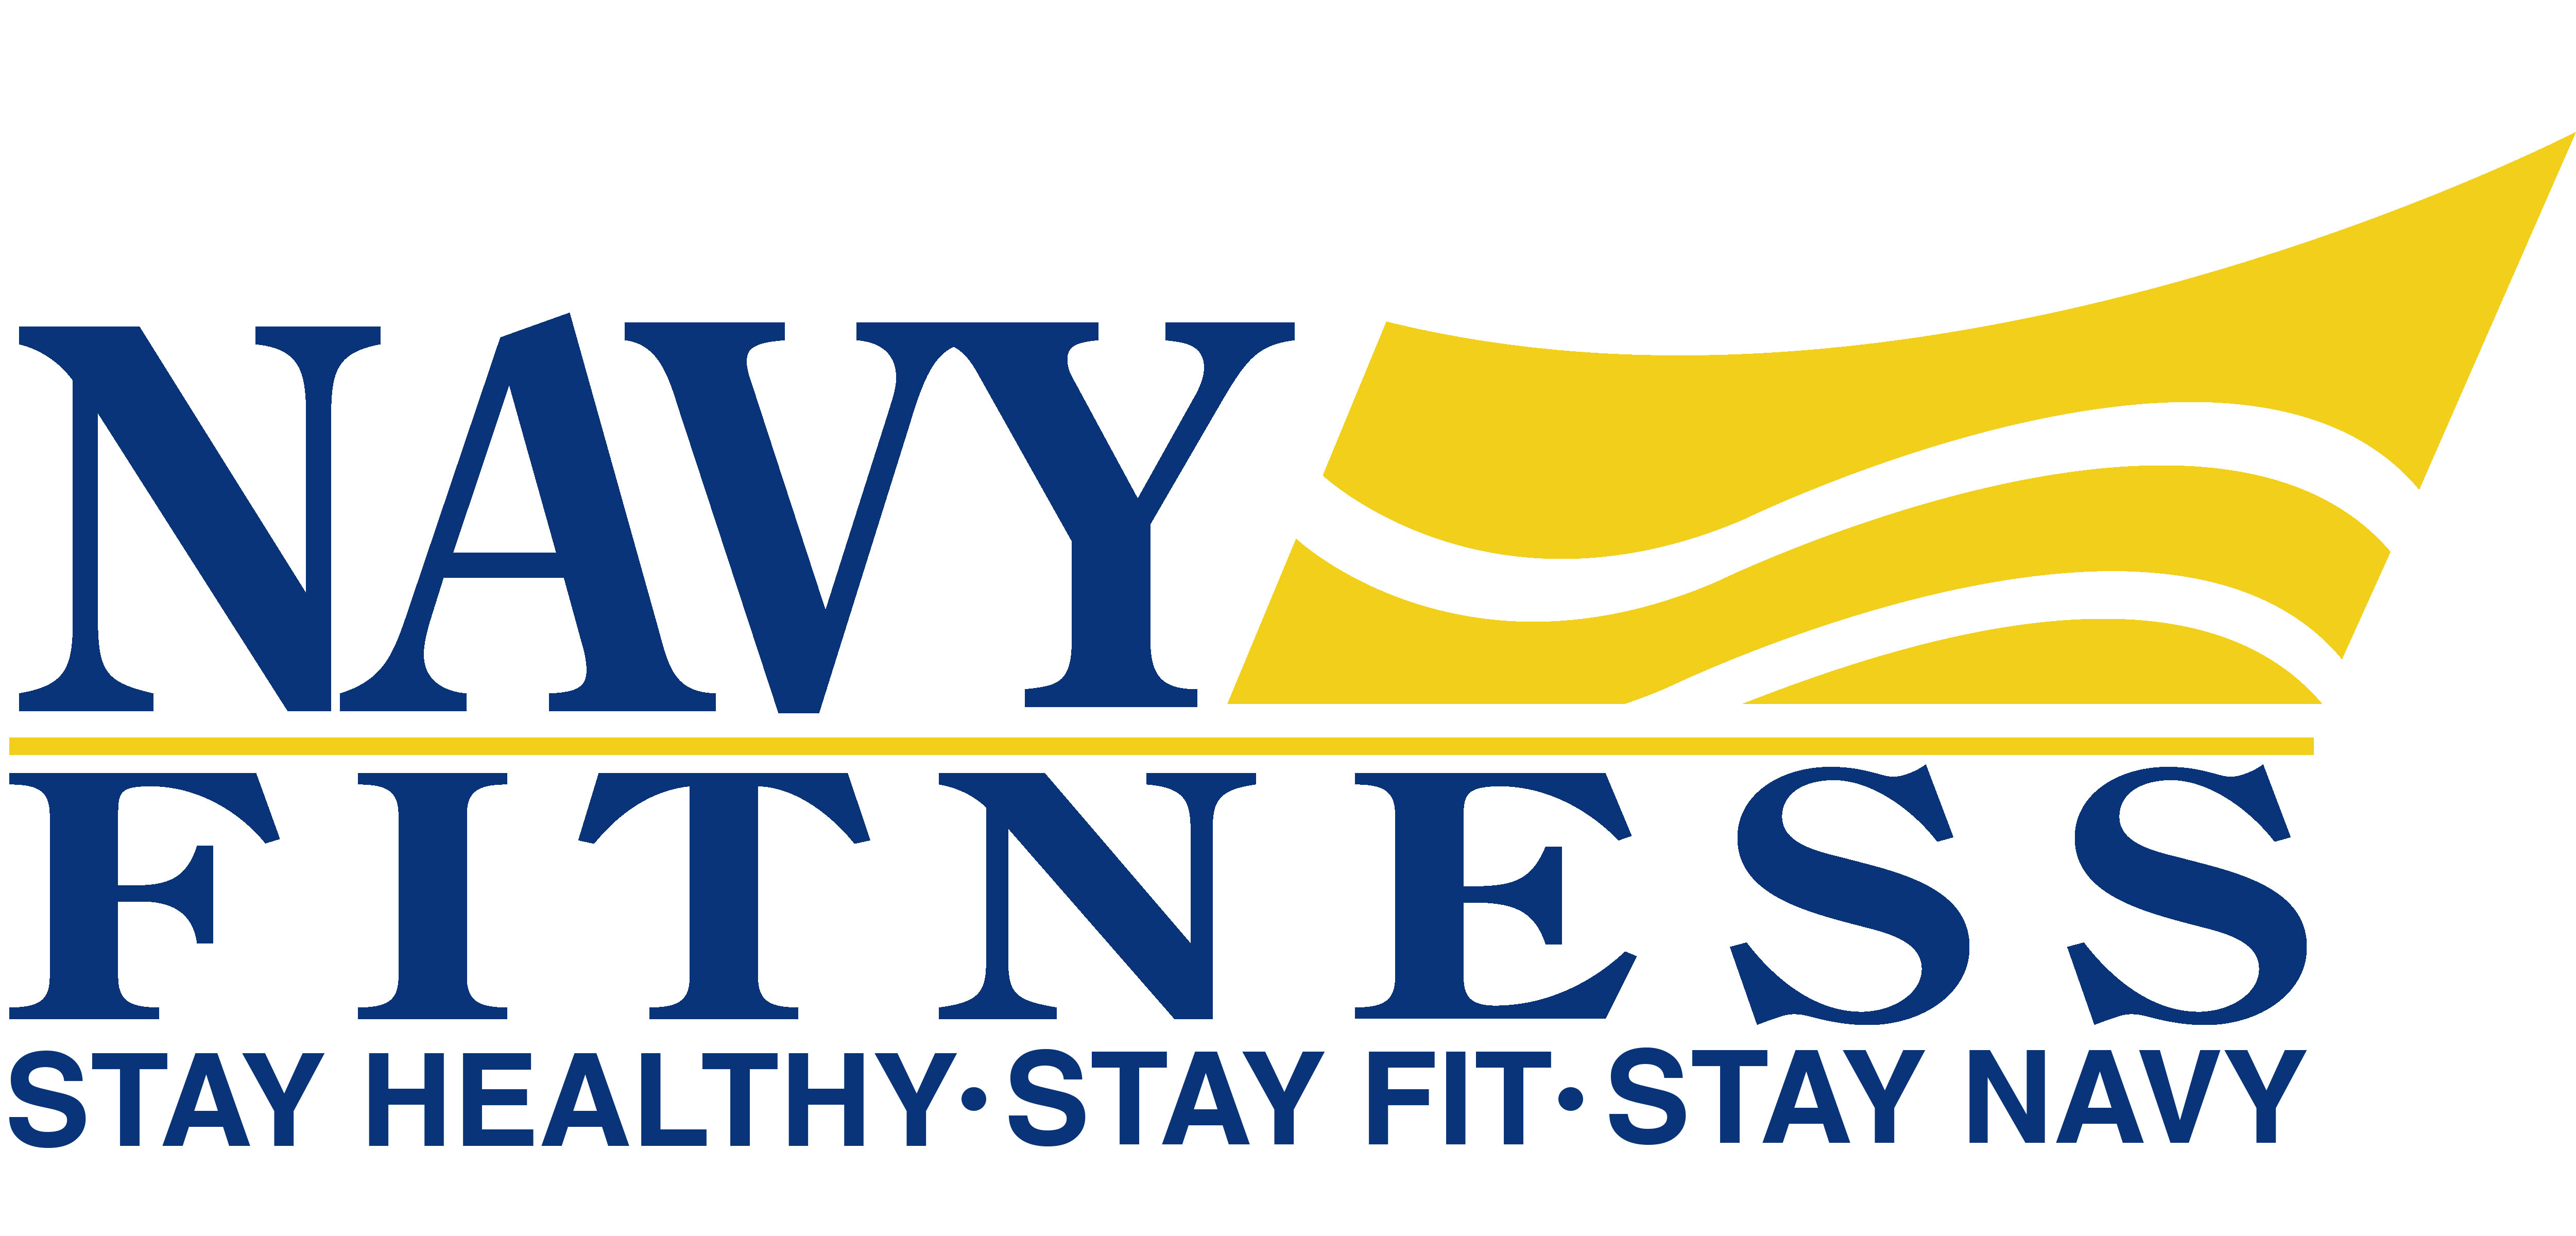 MWR Navy Fitness Logo